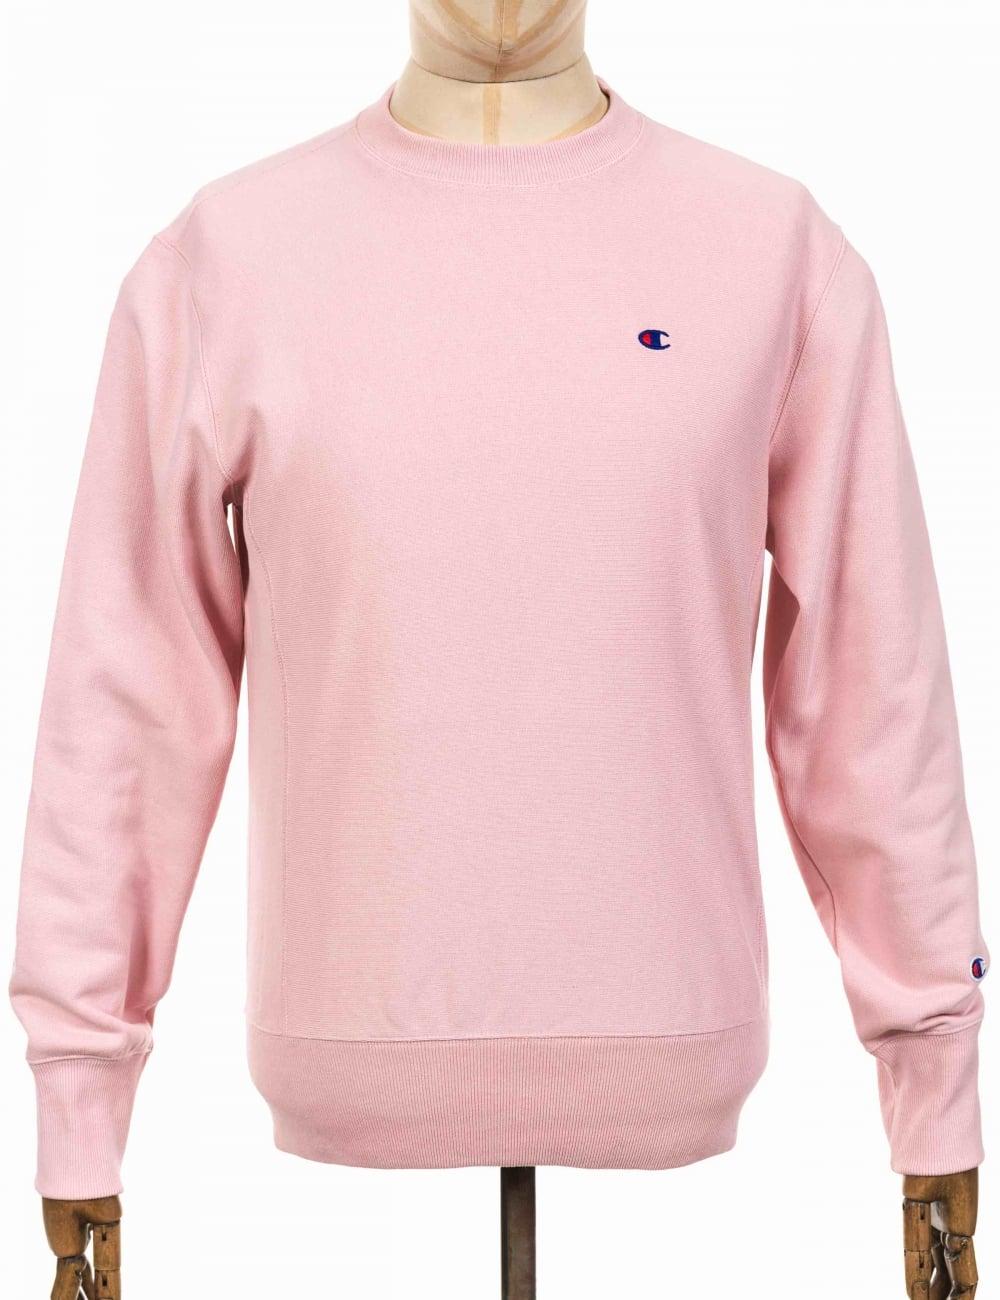 Champion Reverse Weave Crewneck Sweatshirt - CBS Pink - Clothing ... b2db2e3998b1